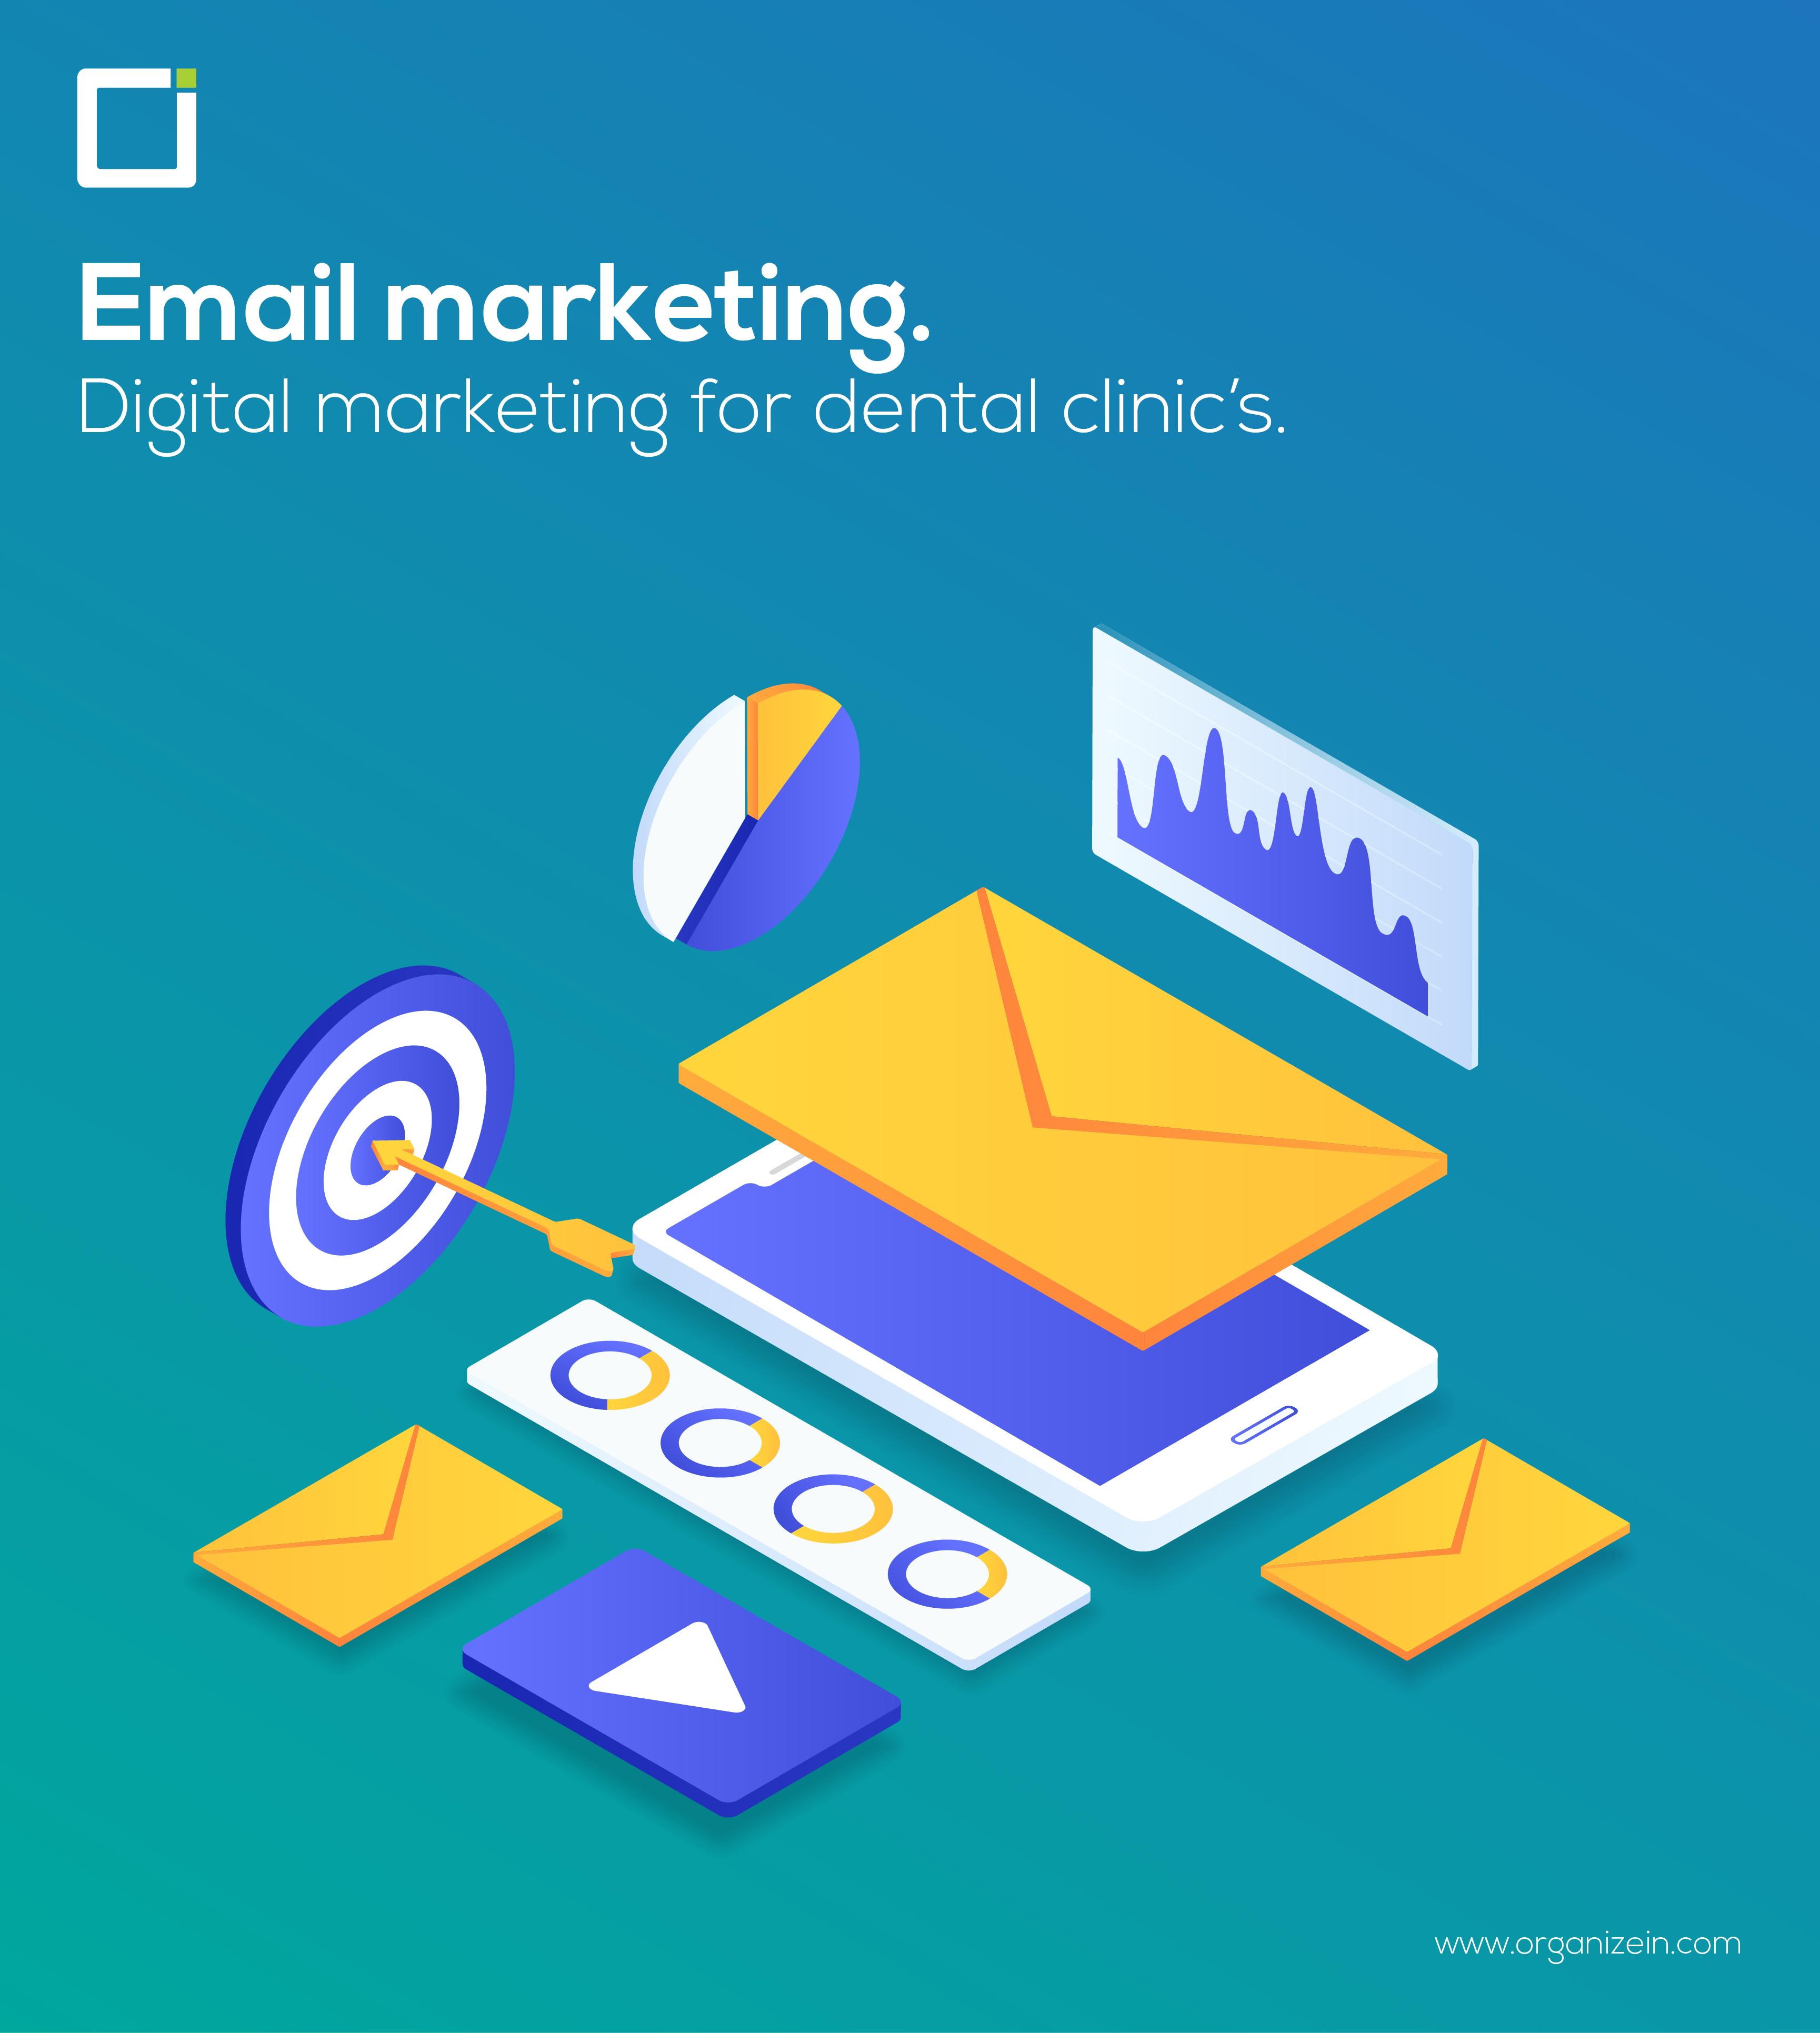 Digital marketing for dental clinics